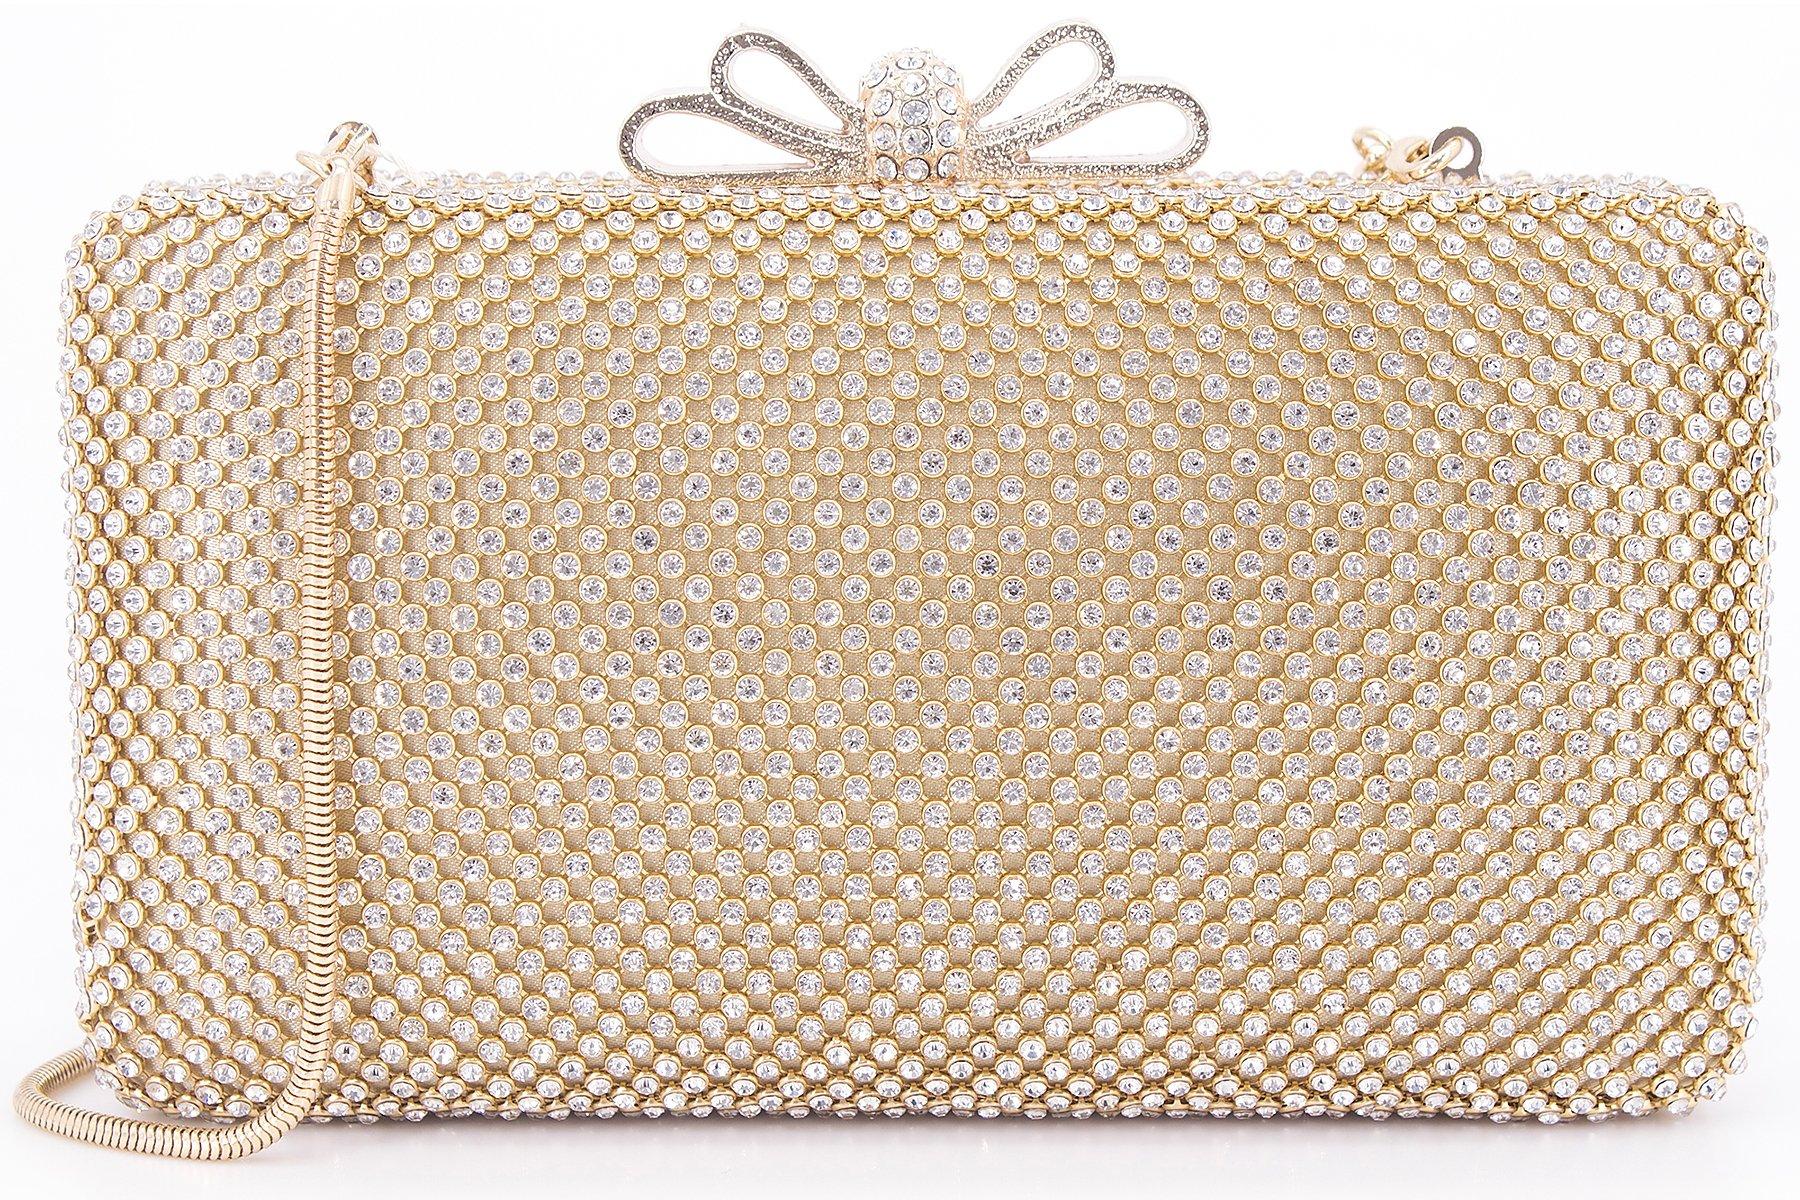 Dexmay Bling Rhinestone Crystal Clutch Purse Bow Clasp Women Evening Bag for Bridesmaid Wedding Party Gold